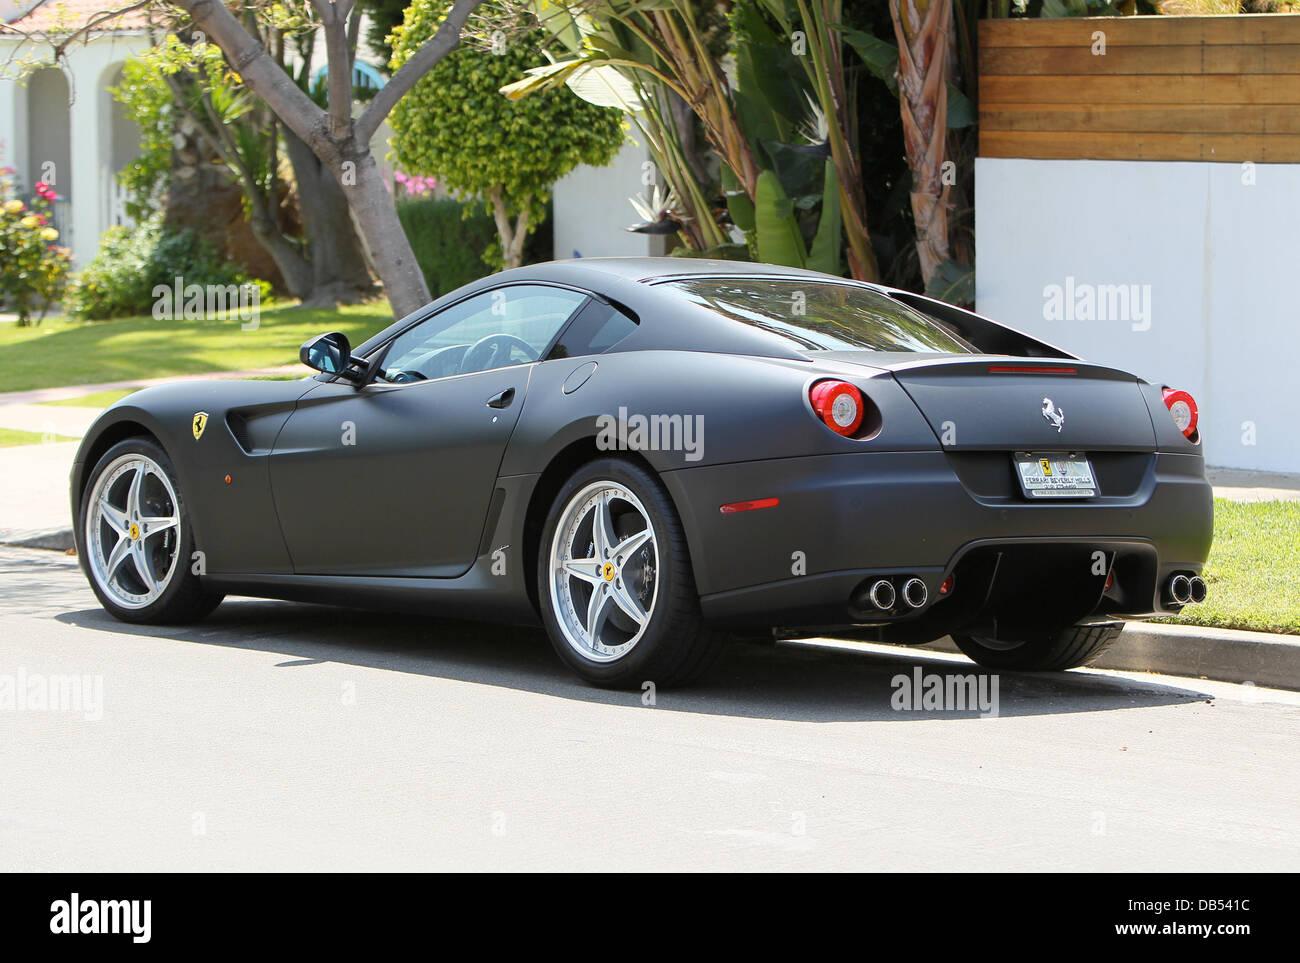 christian audigier and his girlfriend drive his matte black ferrari 599 gtb to look at houses in west hollywood los angeles california 220411 - Matte Black Ferrari 599